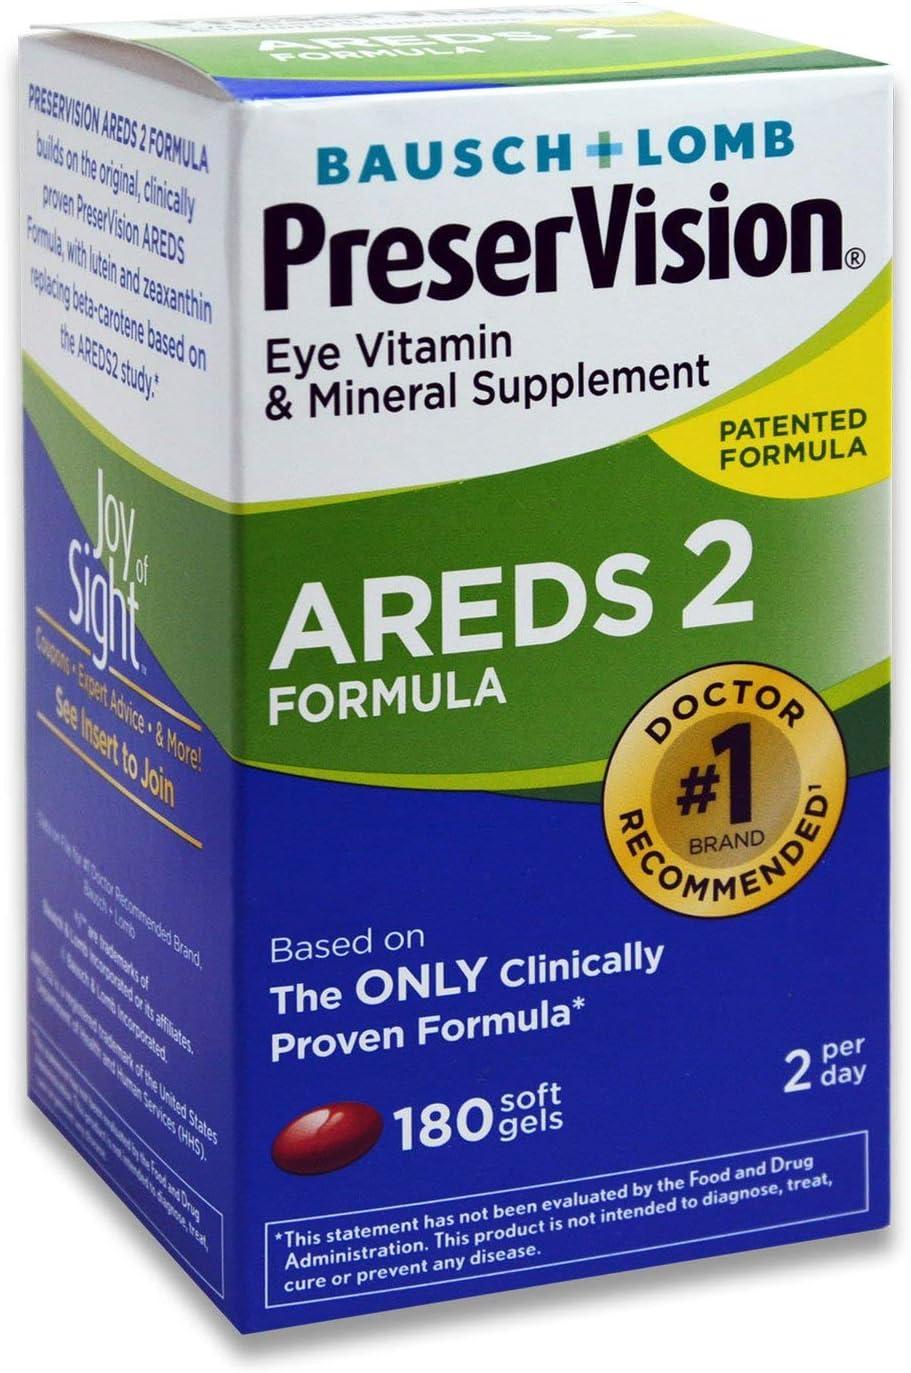 Bausch + Lomb PreserVision AREDS 2 ct. 超美品再入荷品質至上 Formula 180 Supplement 日本全国 送料無料